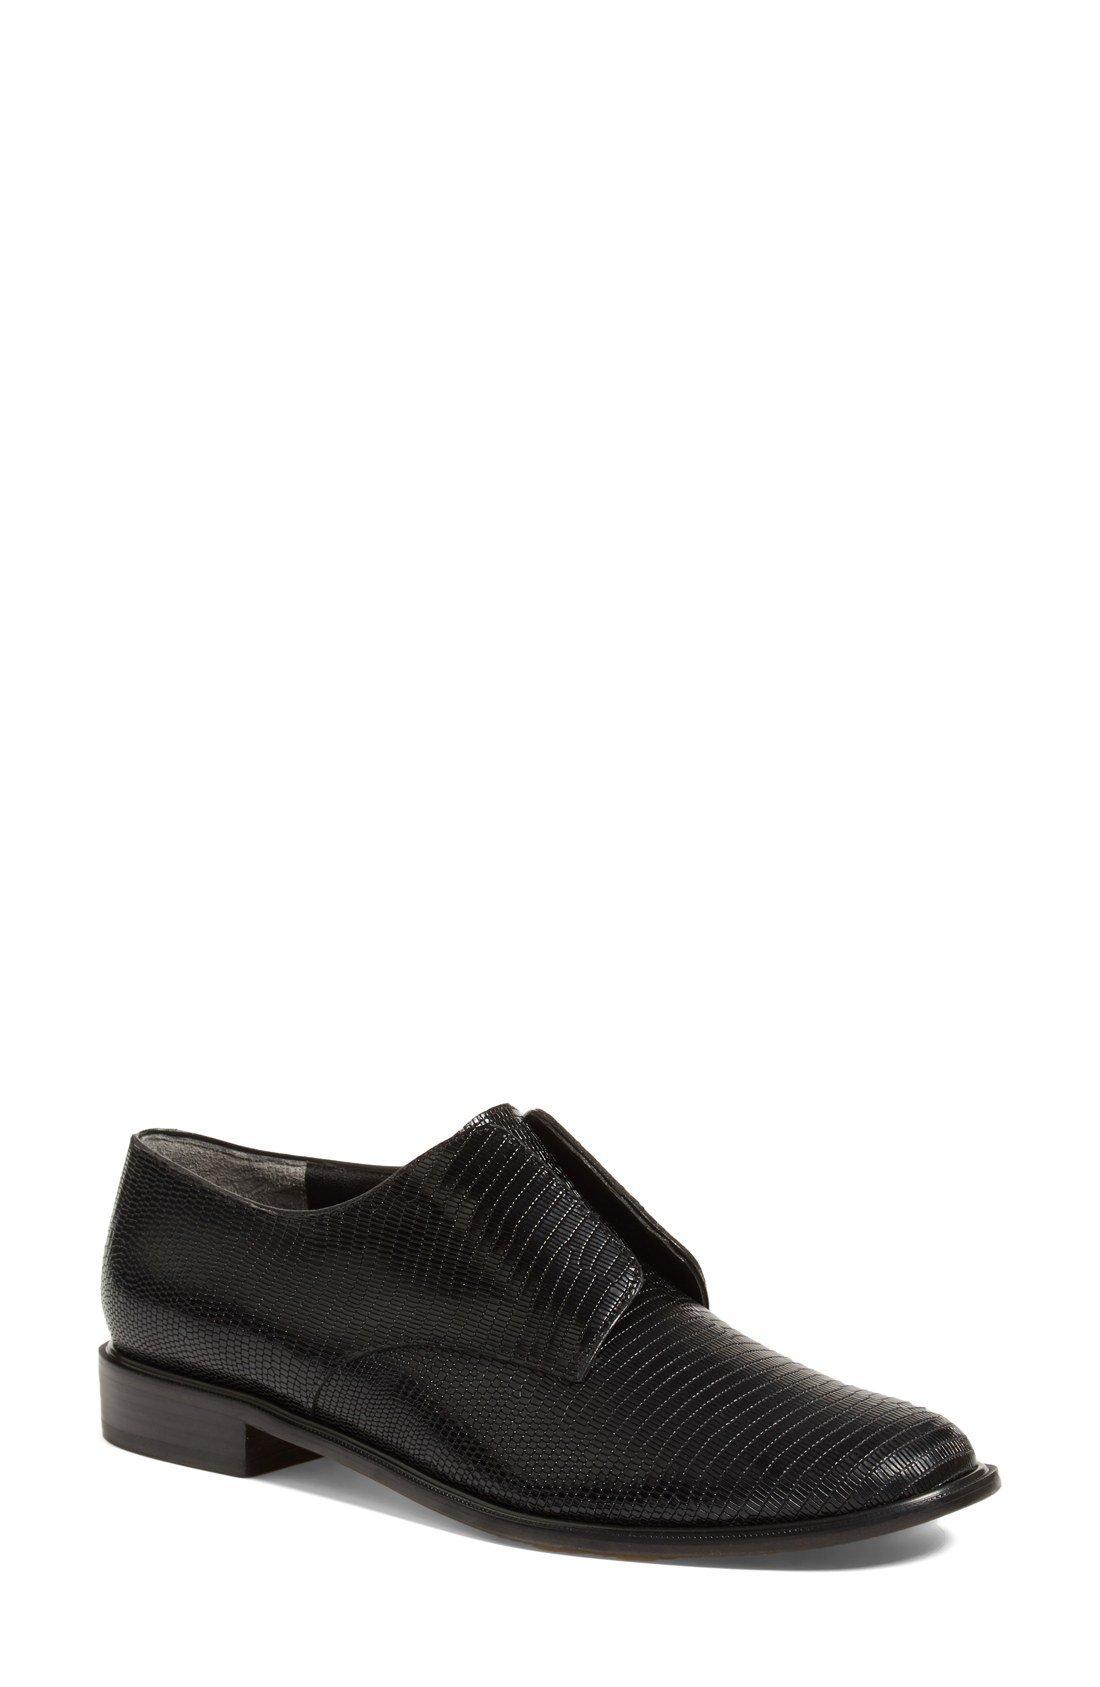 Robert Clergerie Black Jamo Shoes Size 9